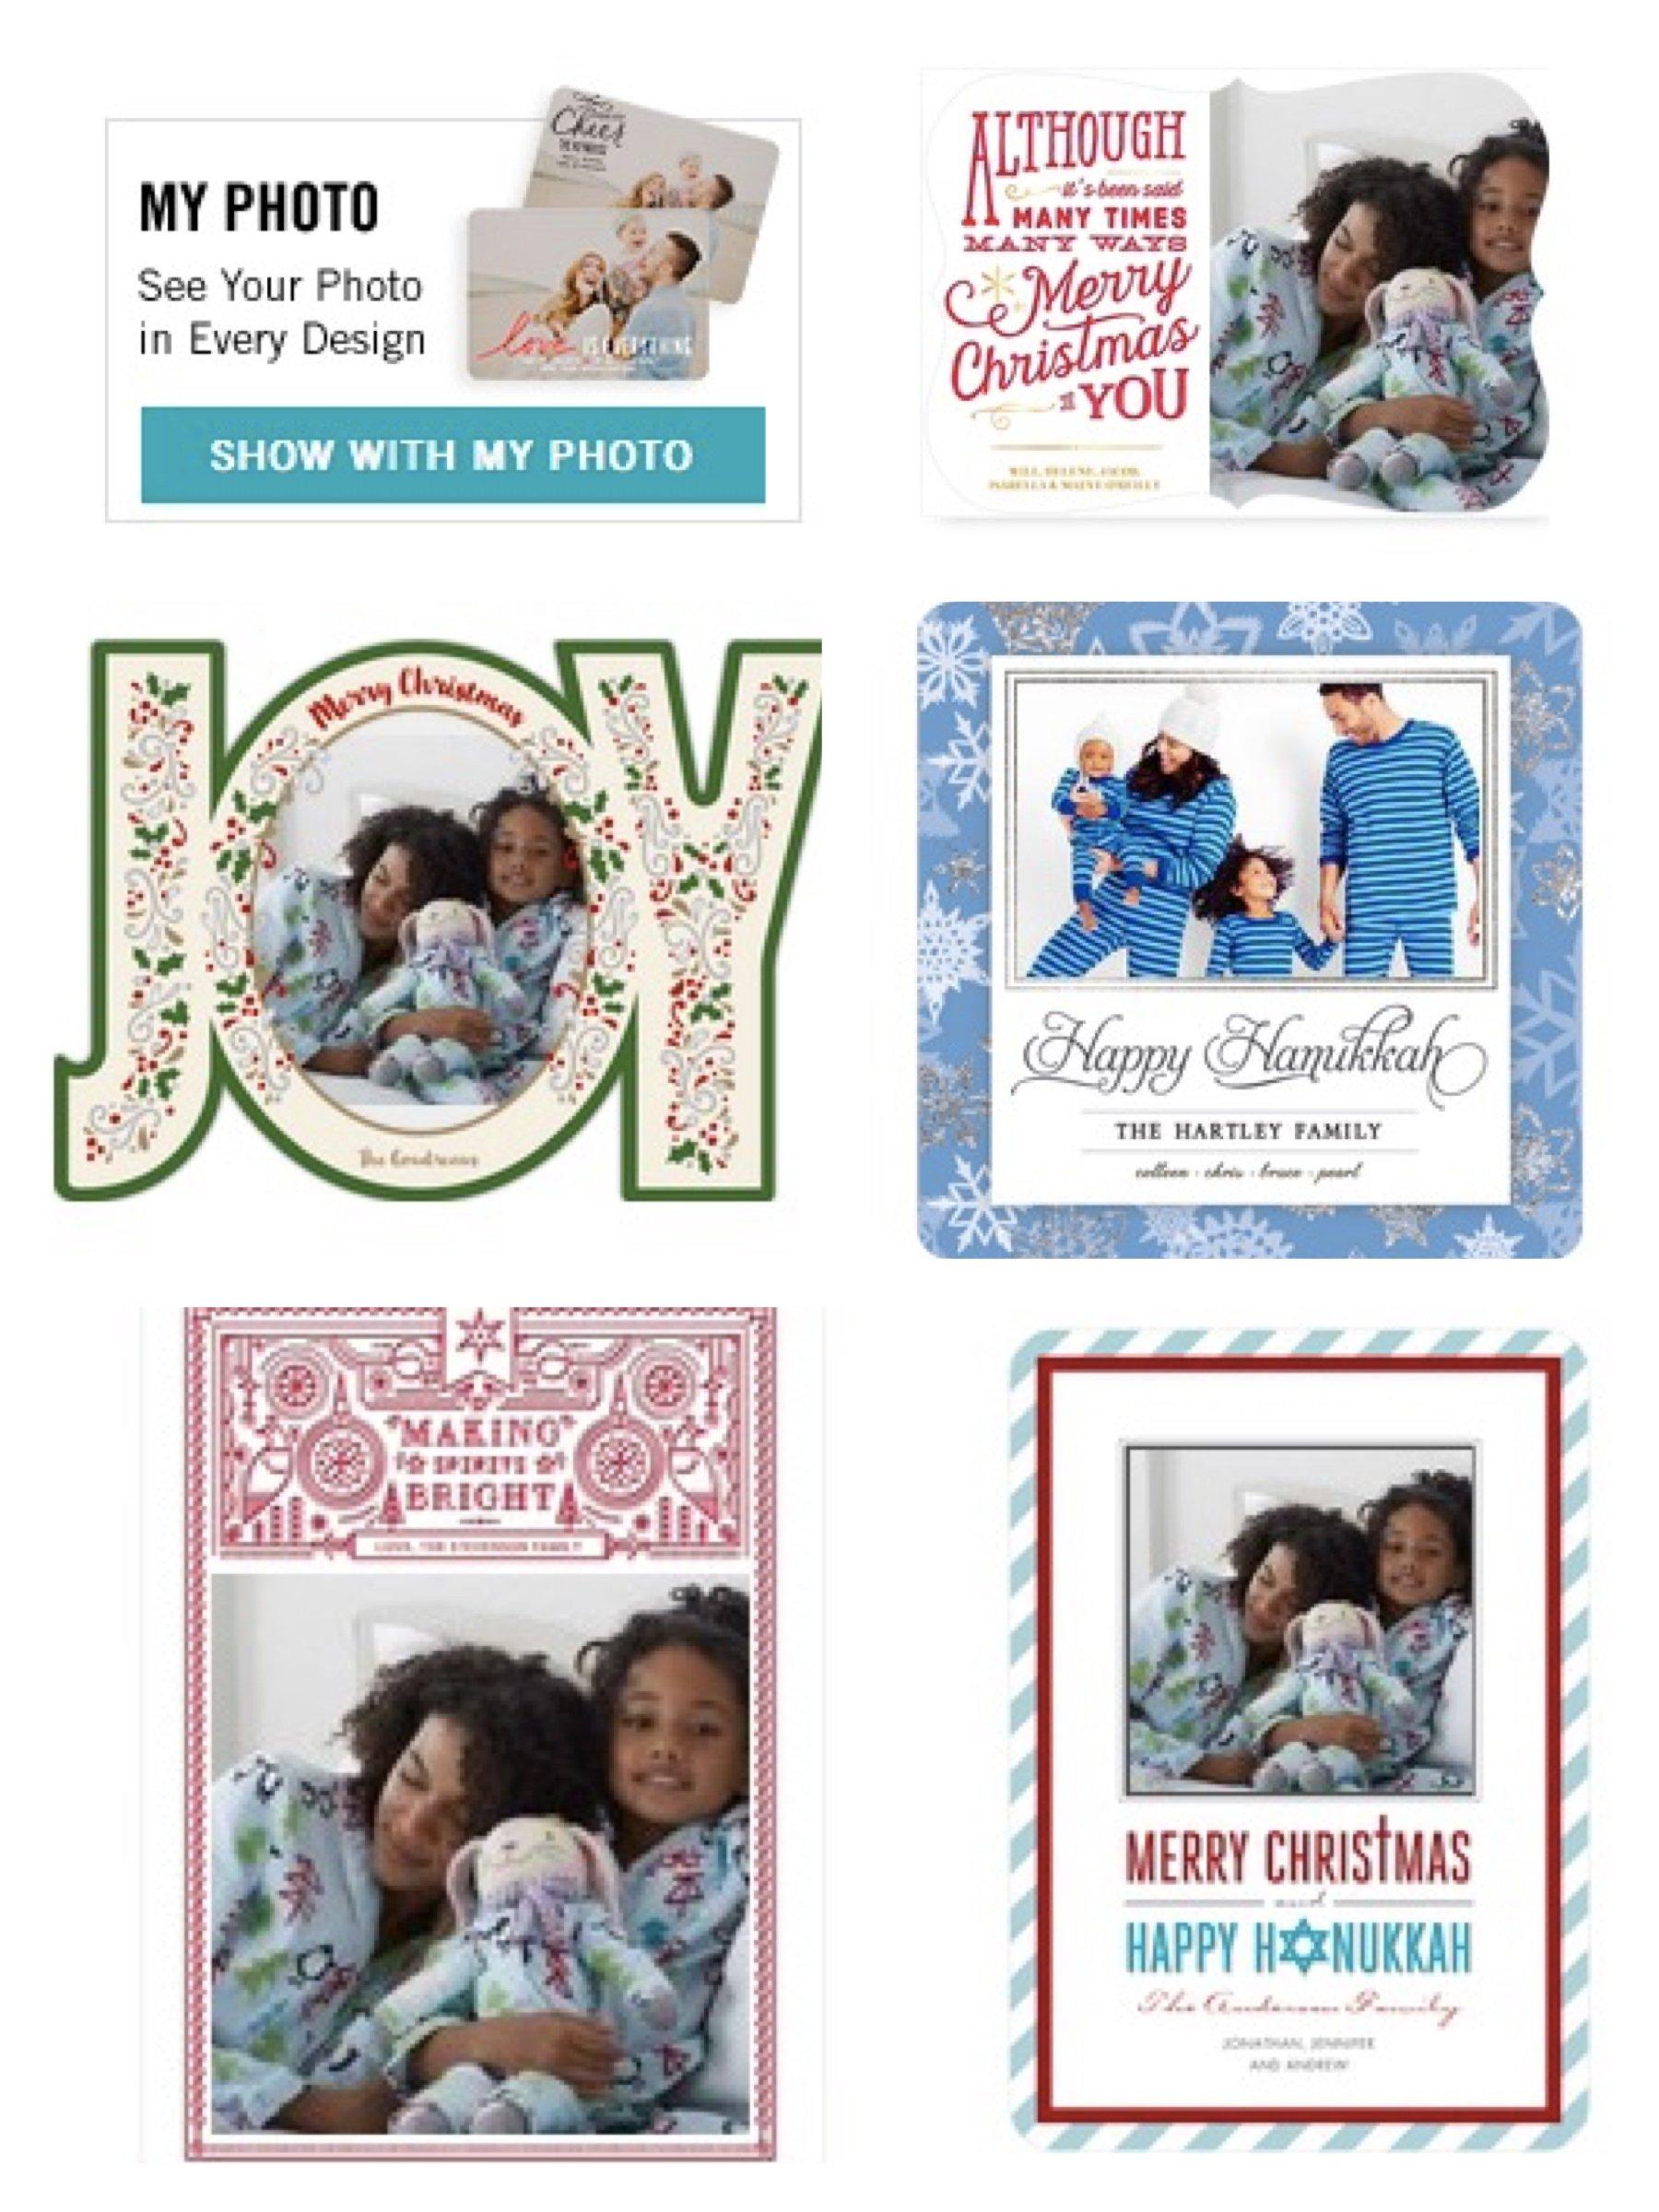 Matching Family Holiday Pajamas in Tiny Prints Christmas and Hanukkah Cards.